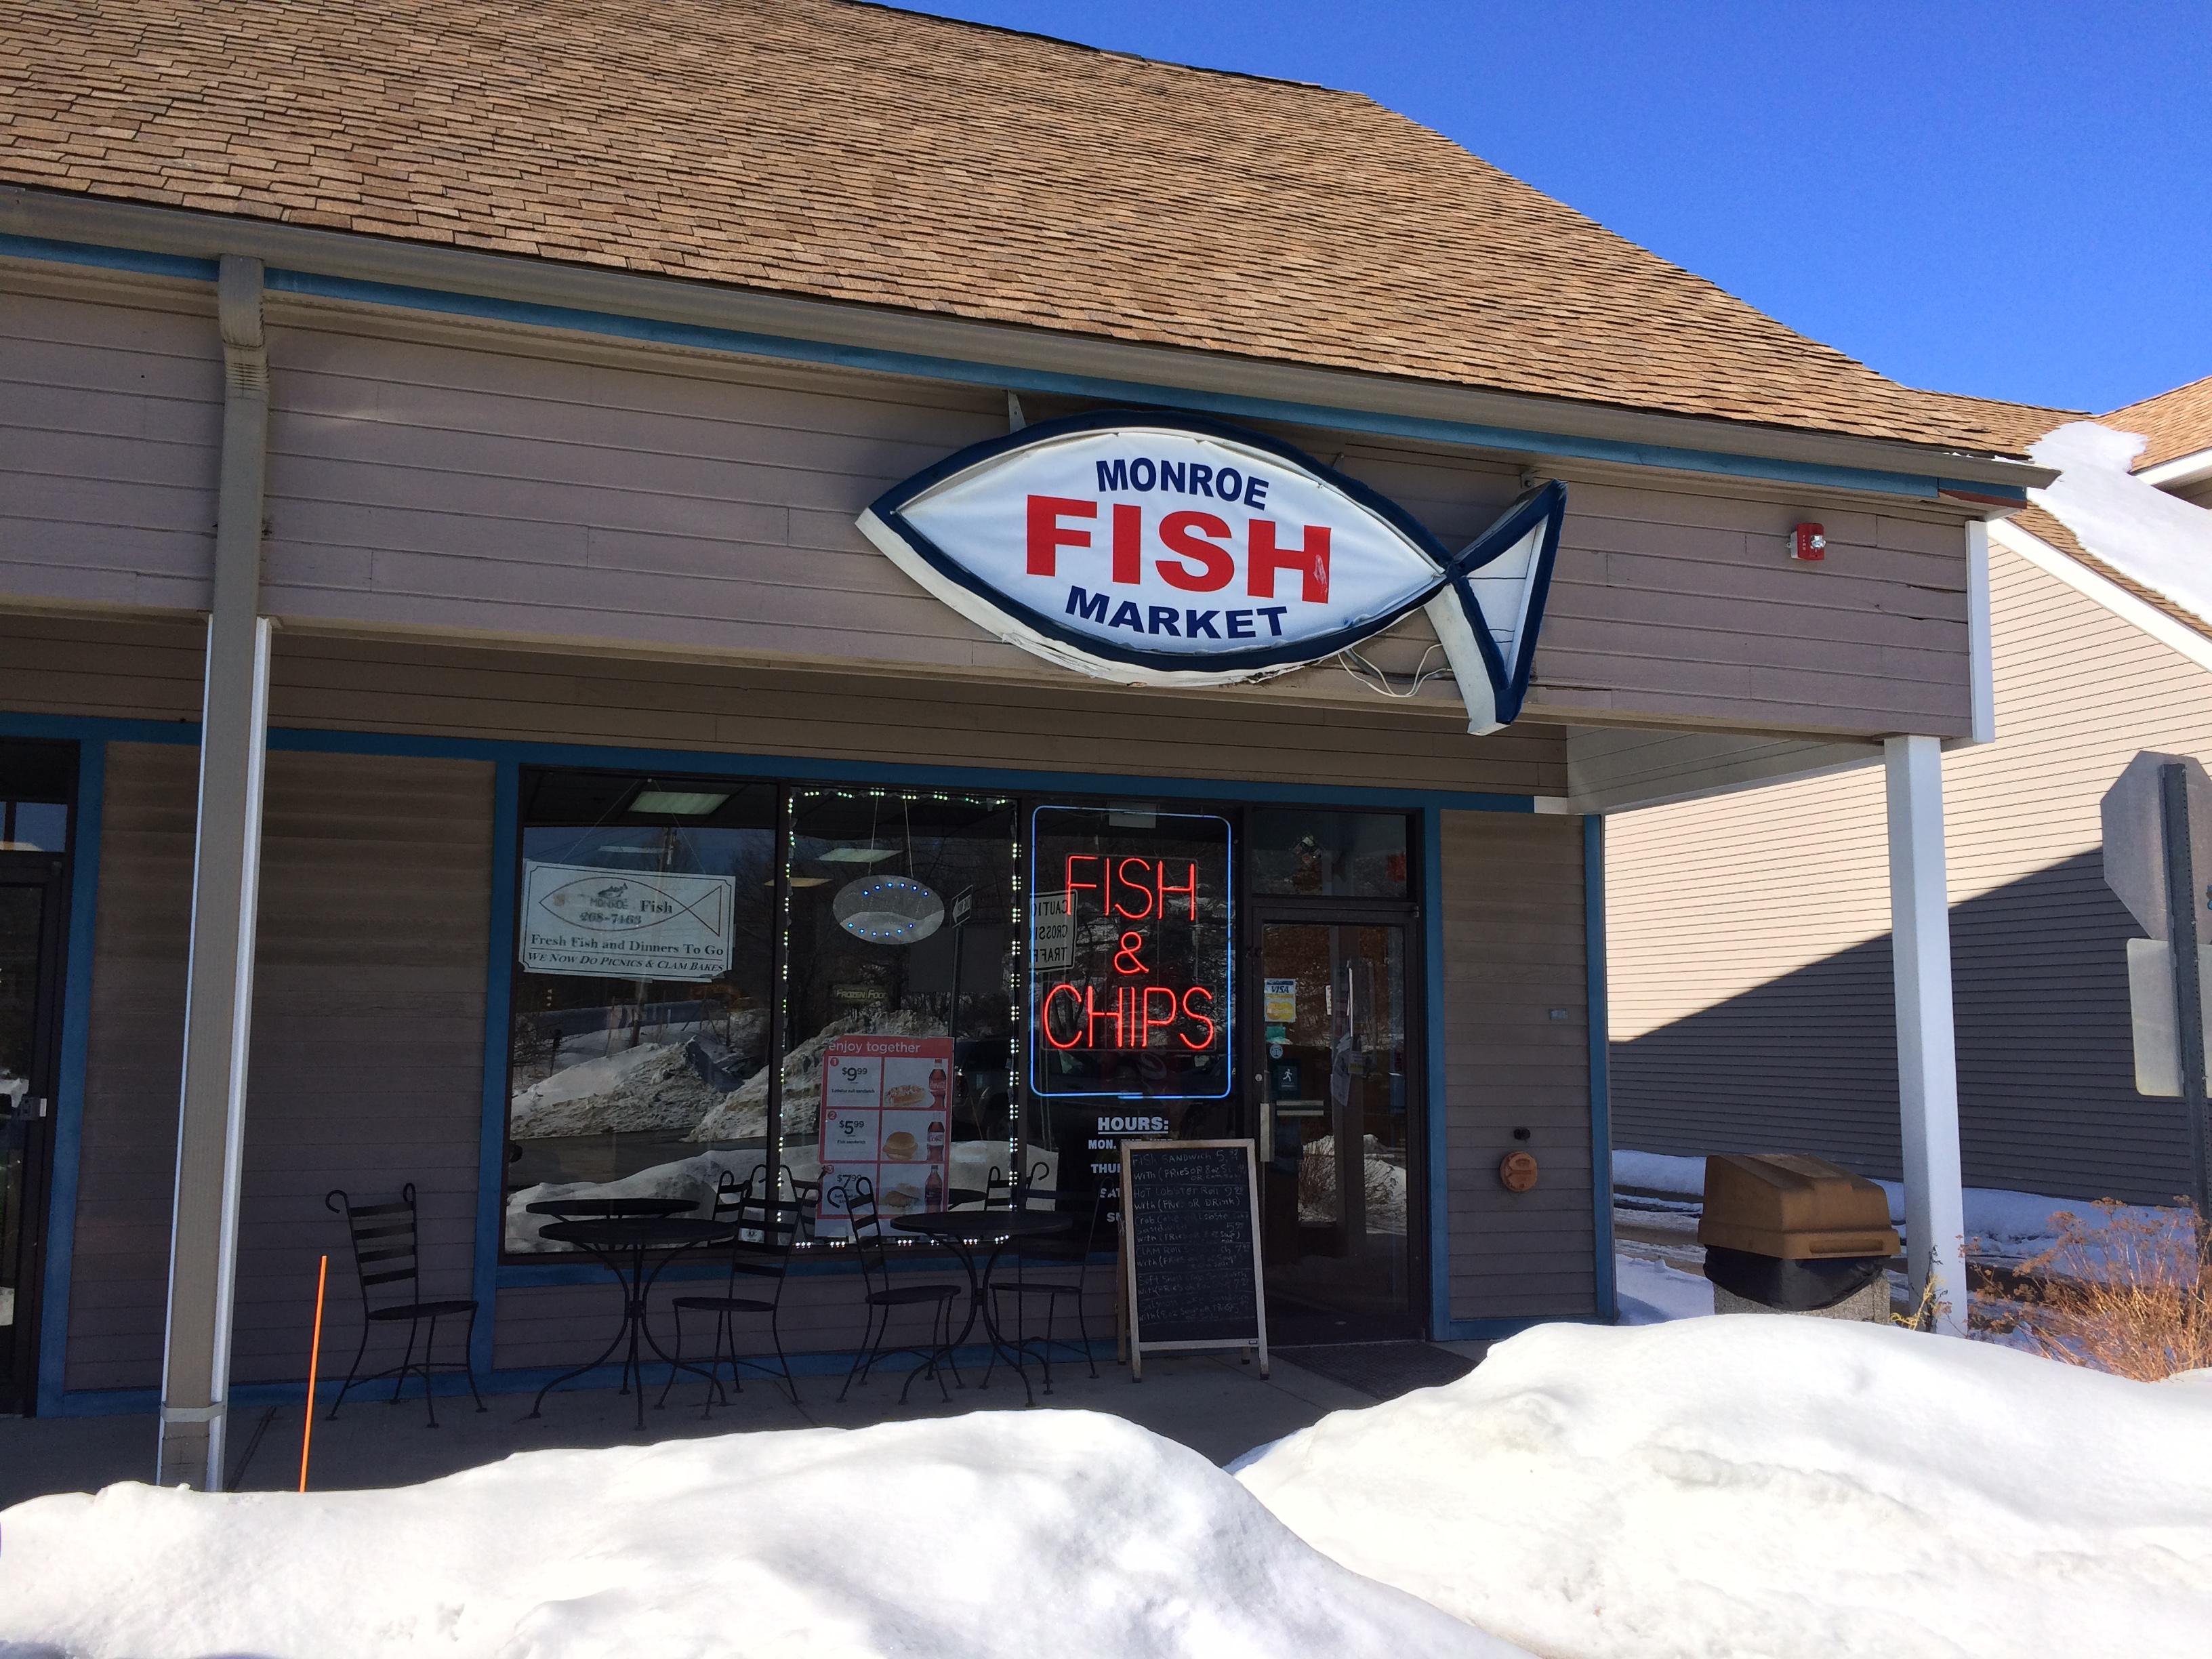 Monroe Fish Market 477 Main St Unit 19 Monroe Ct 06468